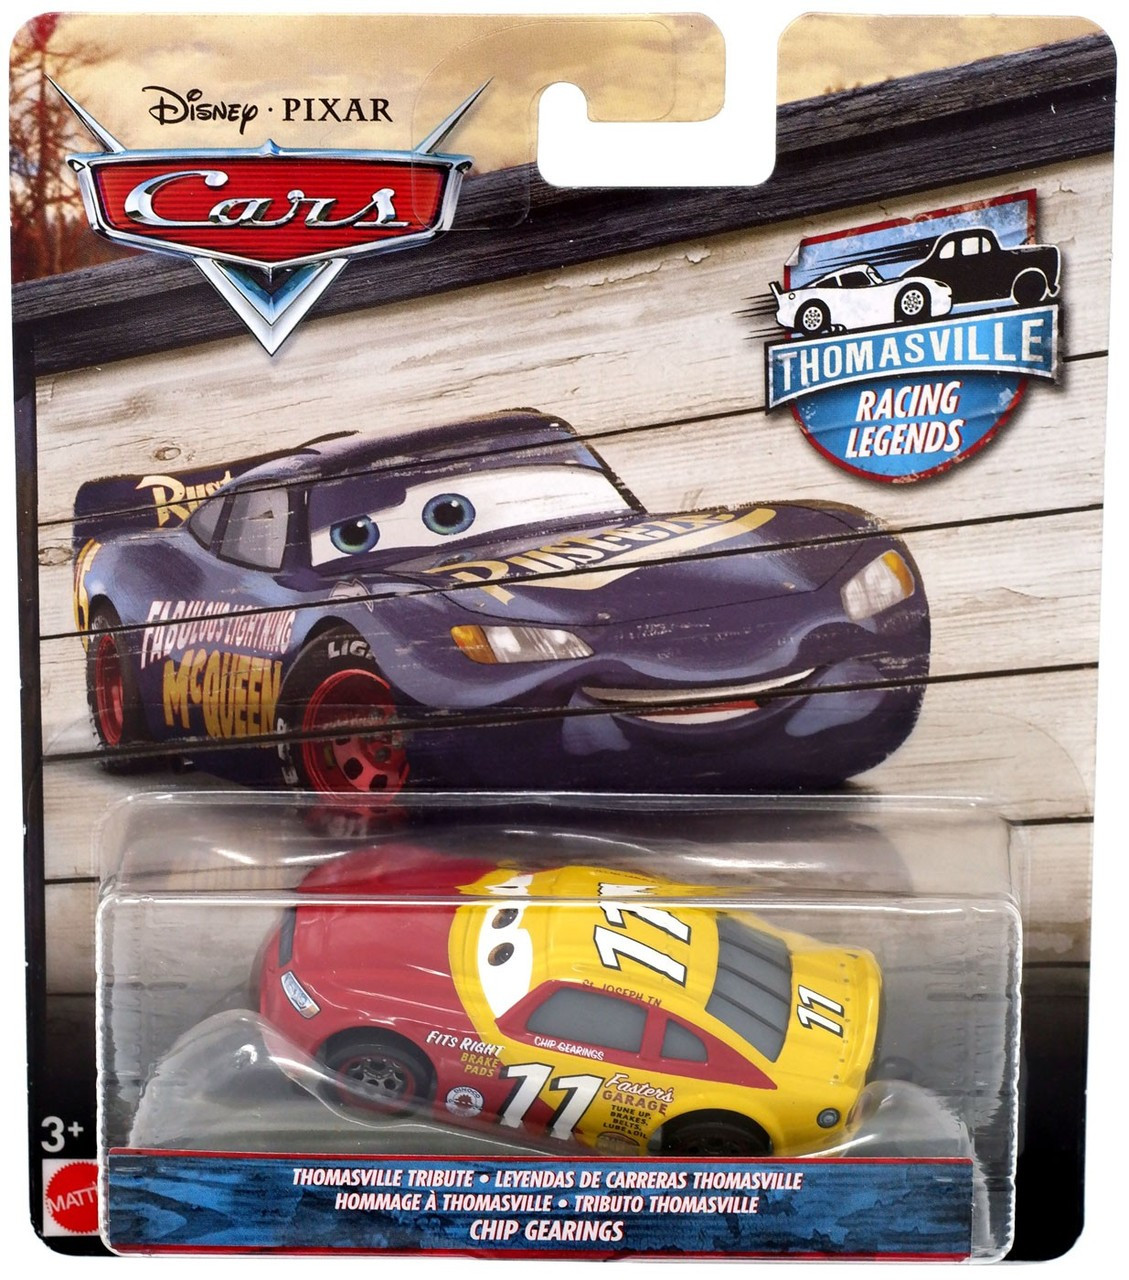 Carthomasville Disney Legends Chip 3 Pixar Tribute Thomasville Gearings Diecast Racing Cars wOPTXlZuki